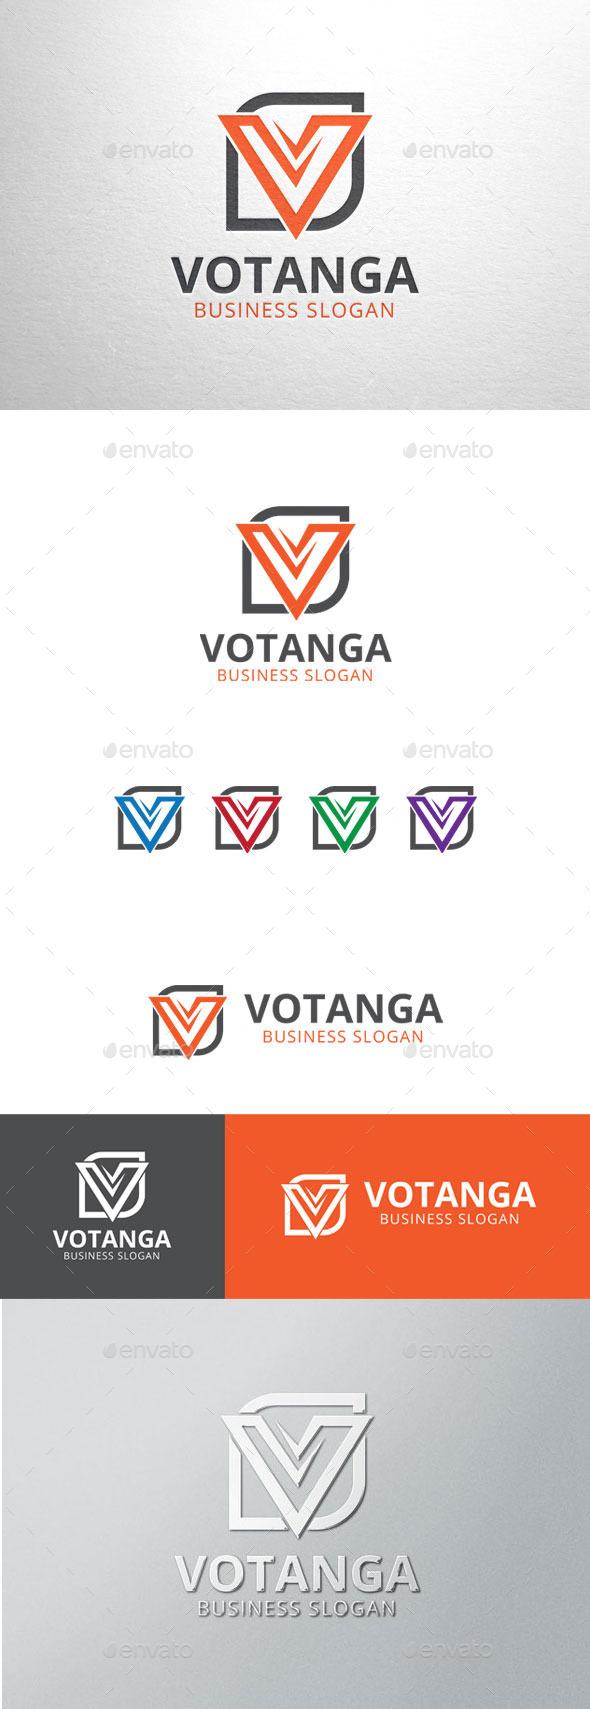 GraphicRiver Votanga Letter V Logo 11166999